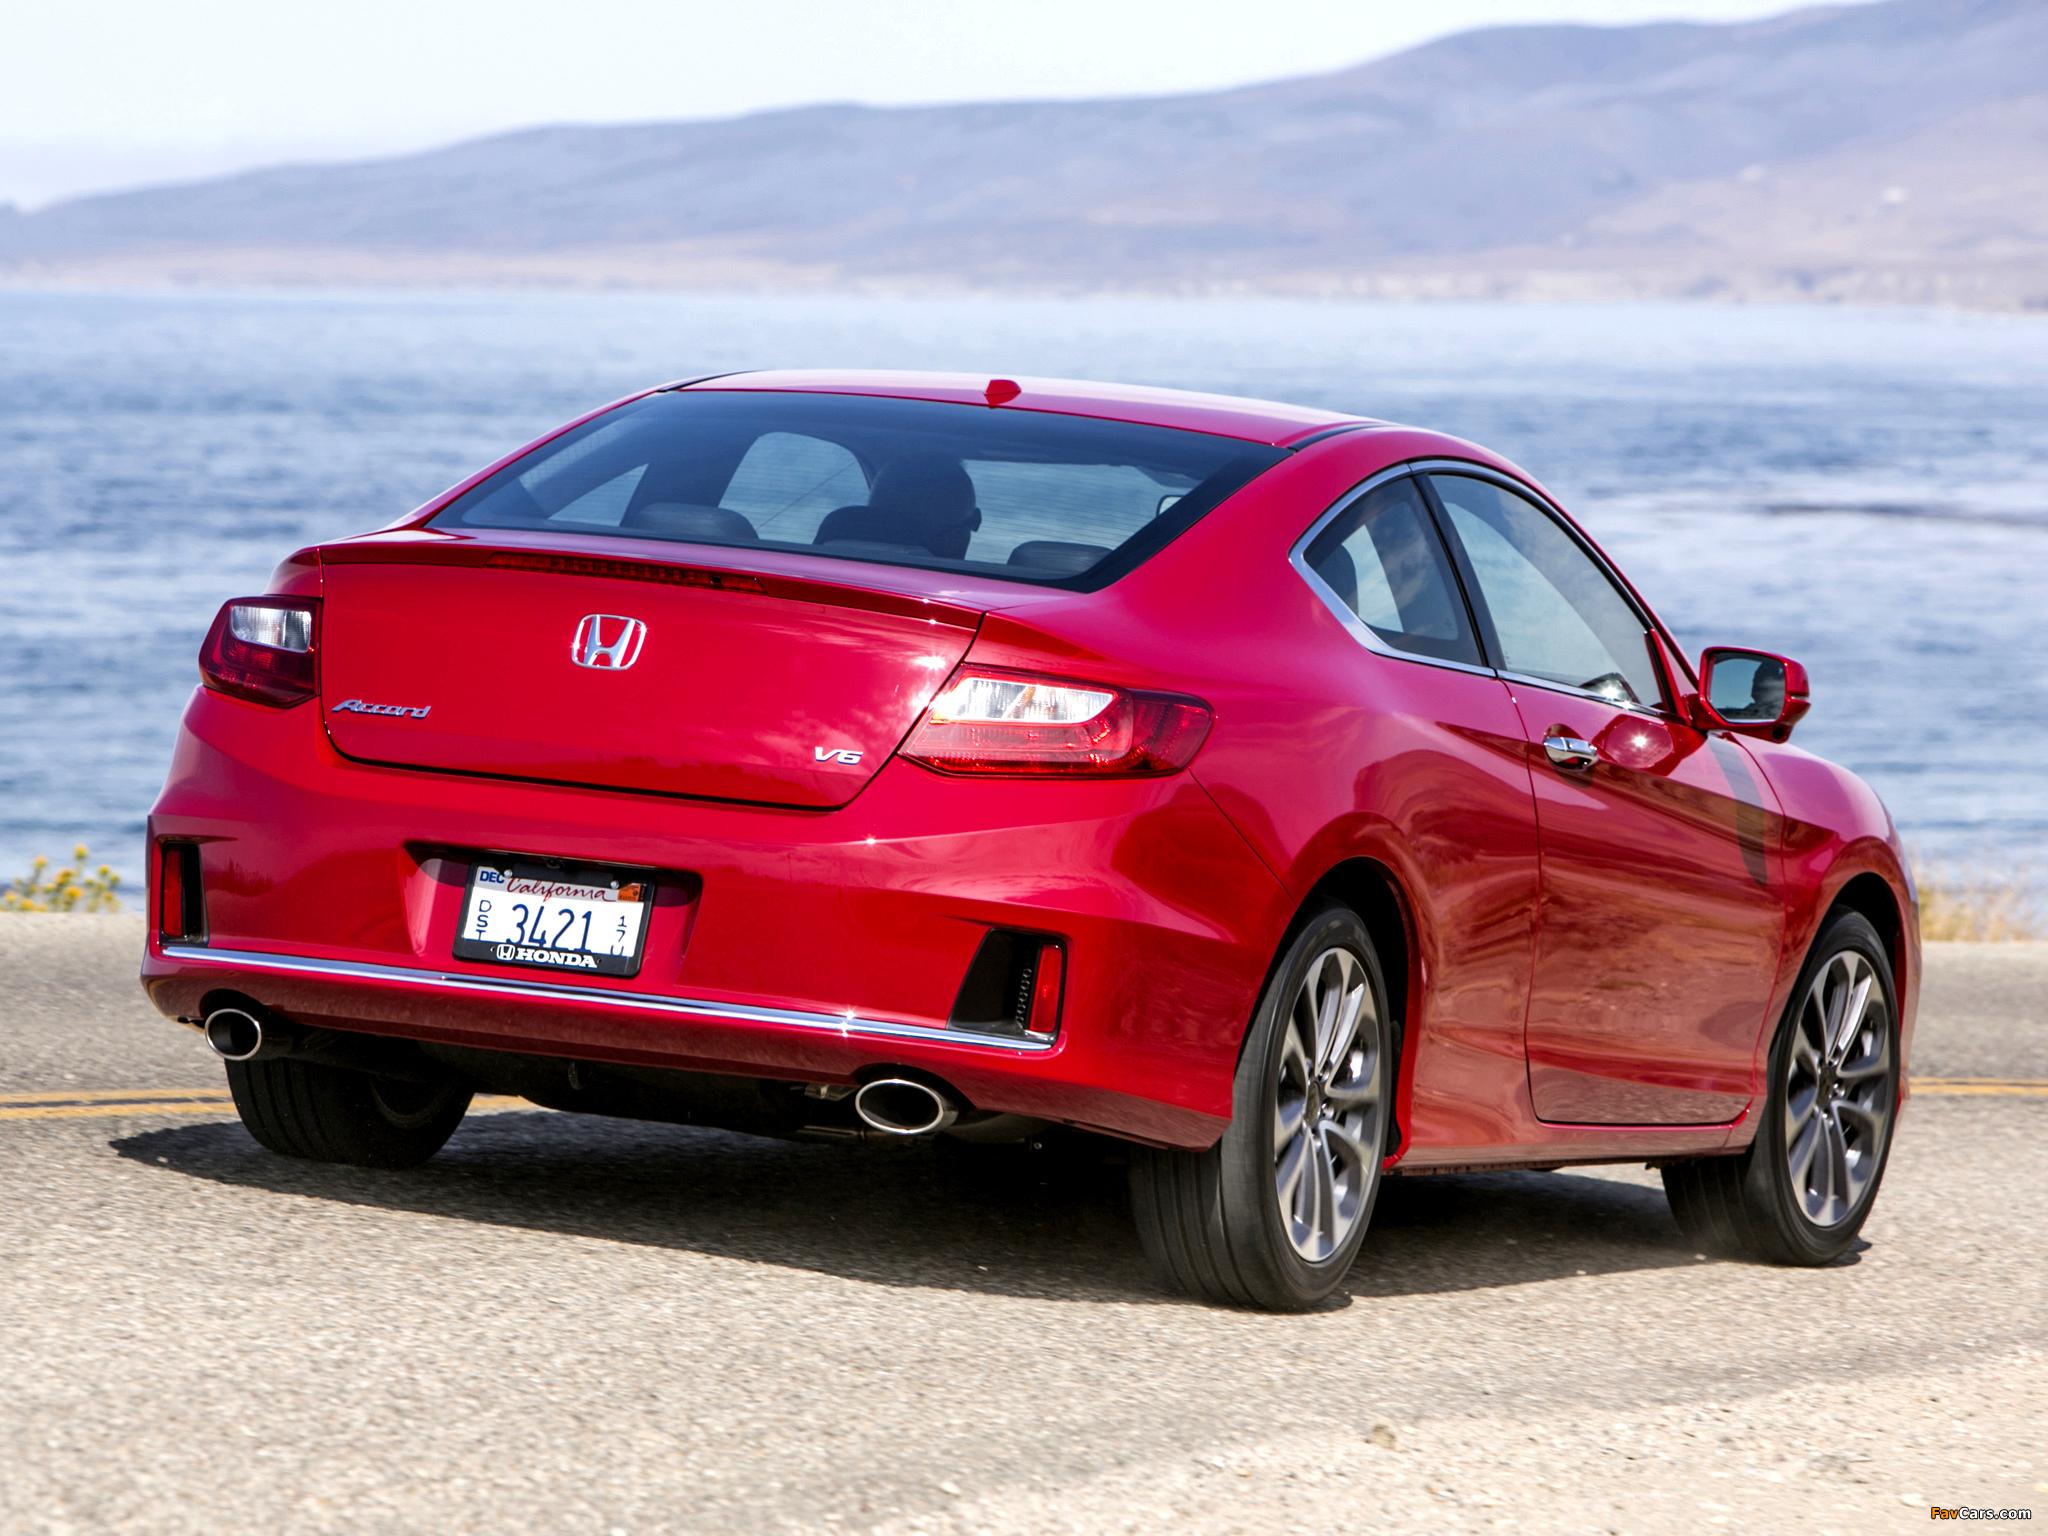 2012 Honda Accord Coupe V6 Car Insurance Info Image